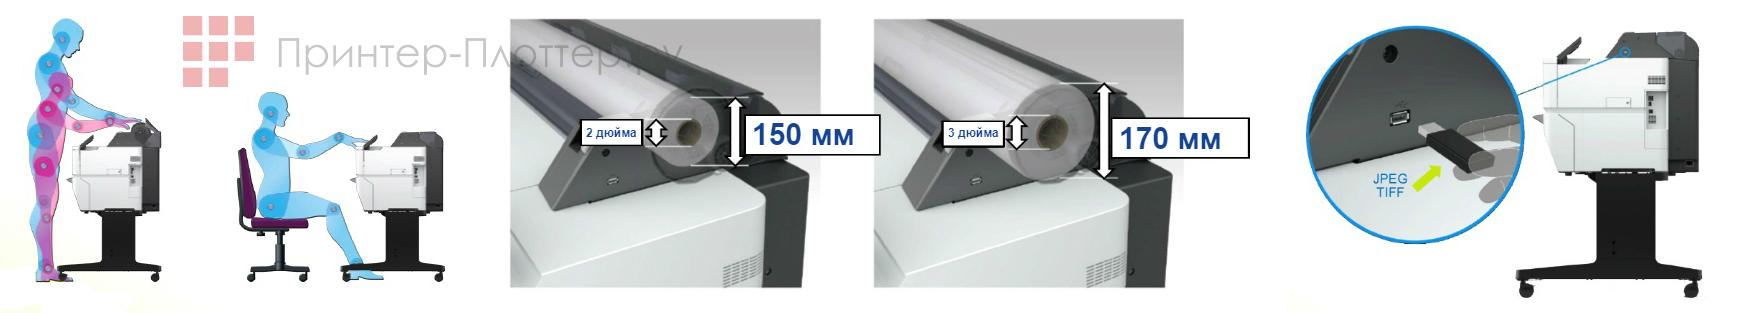 Epson SureColor SC-Tx400. Удобство работы